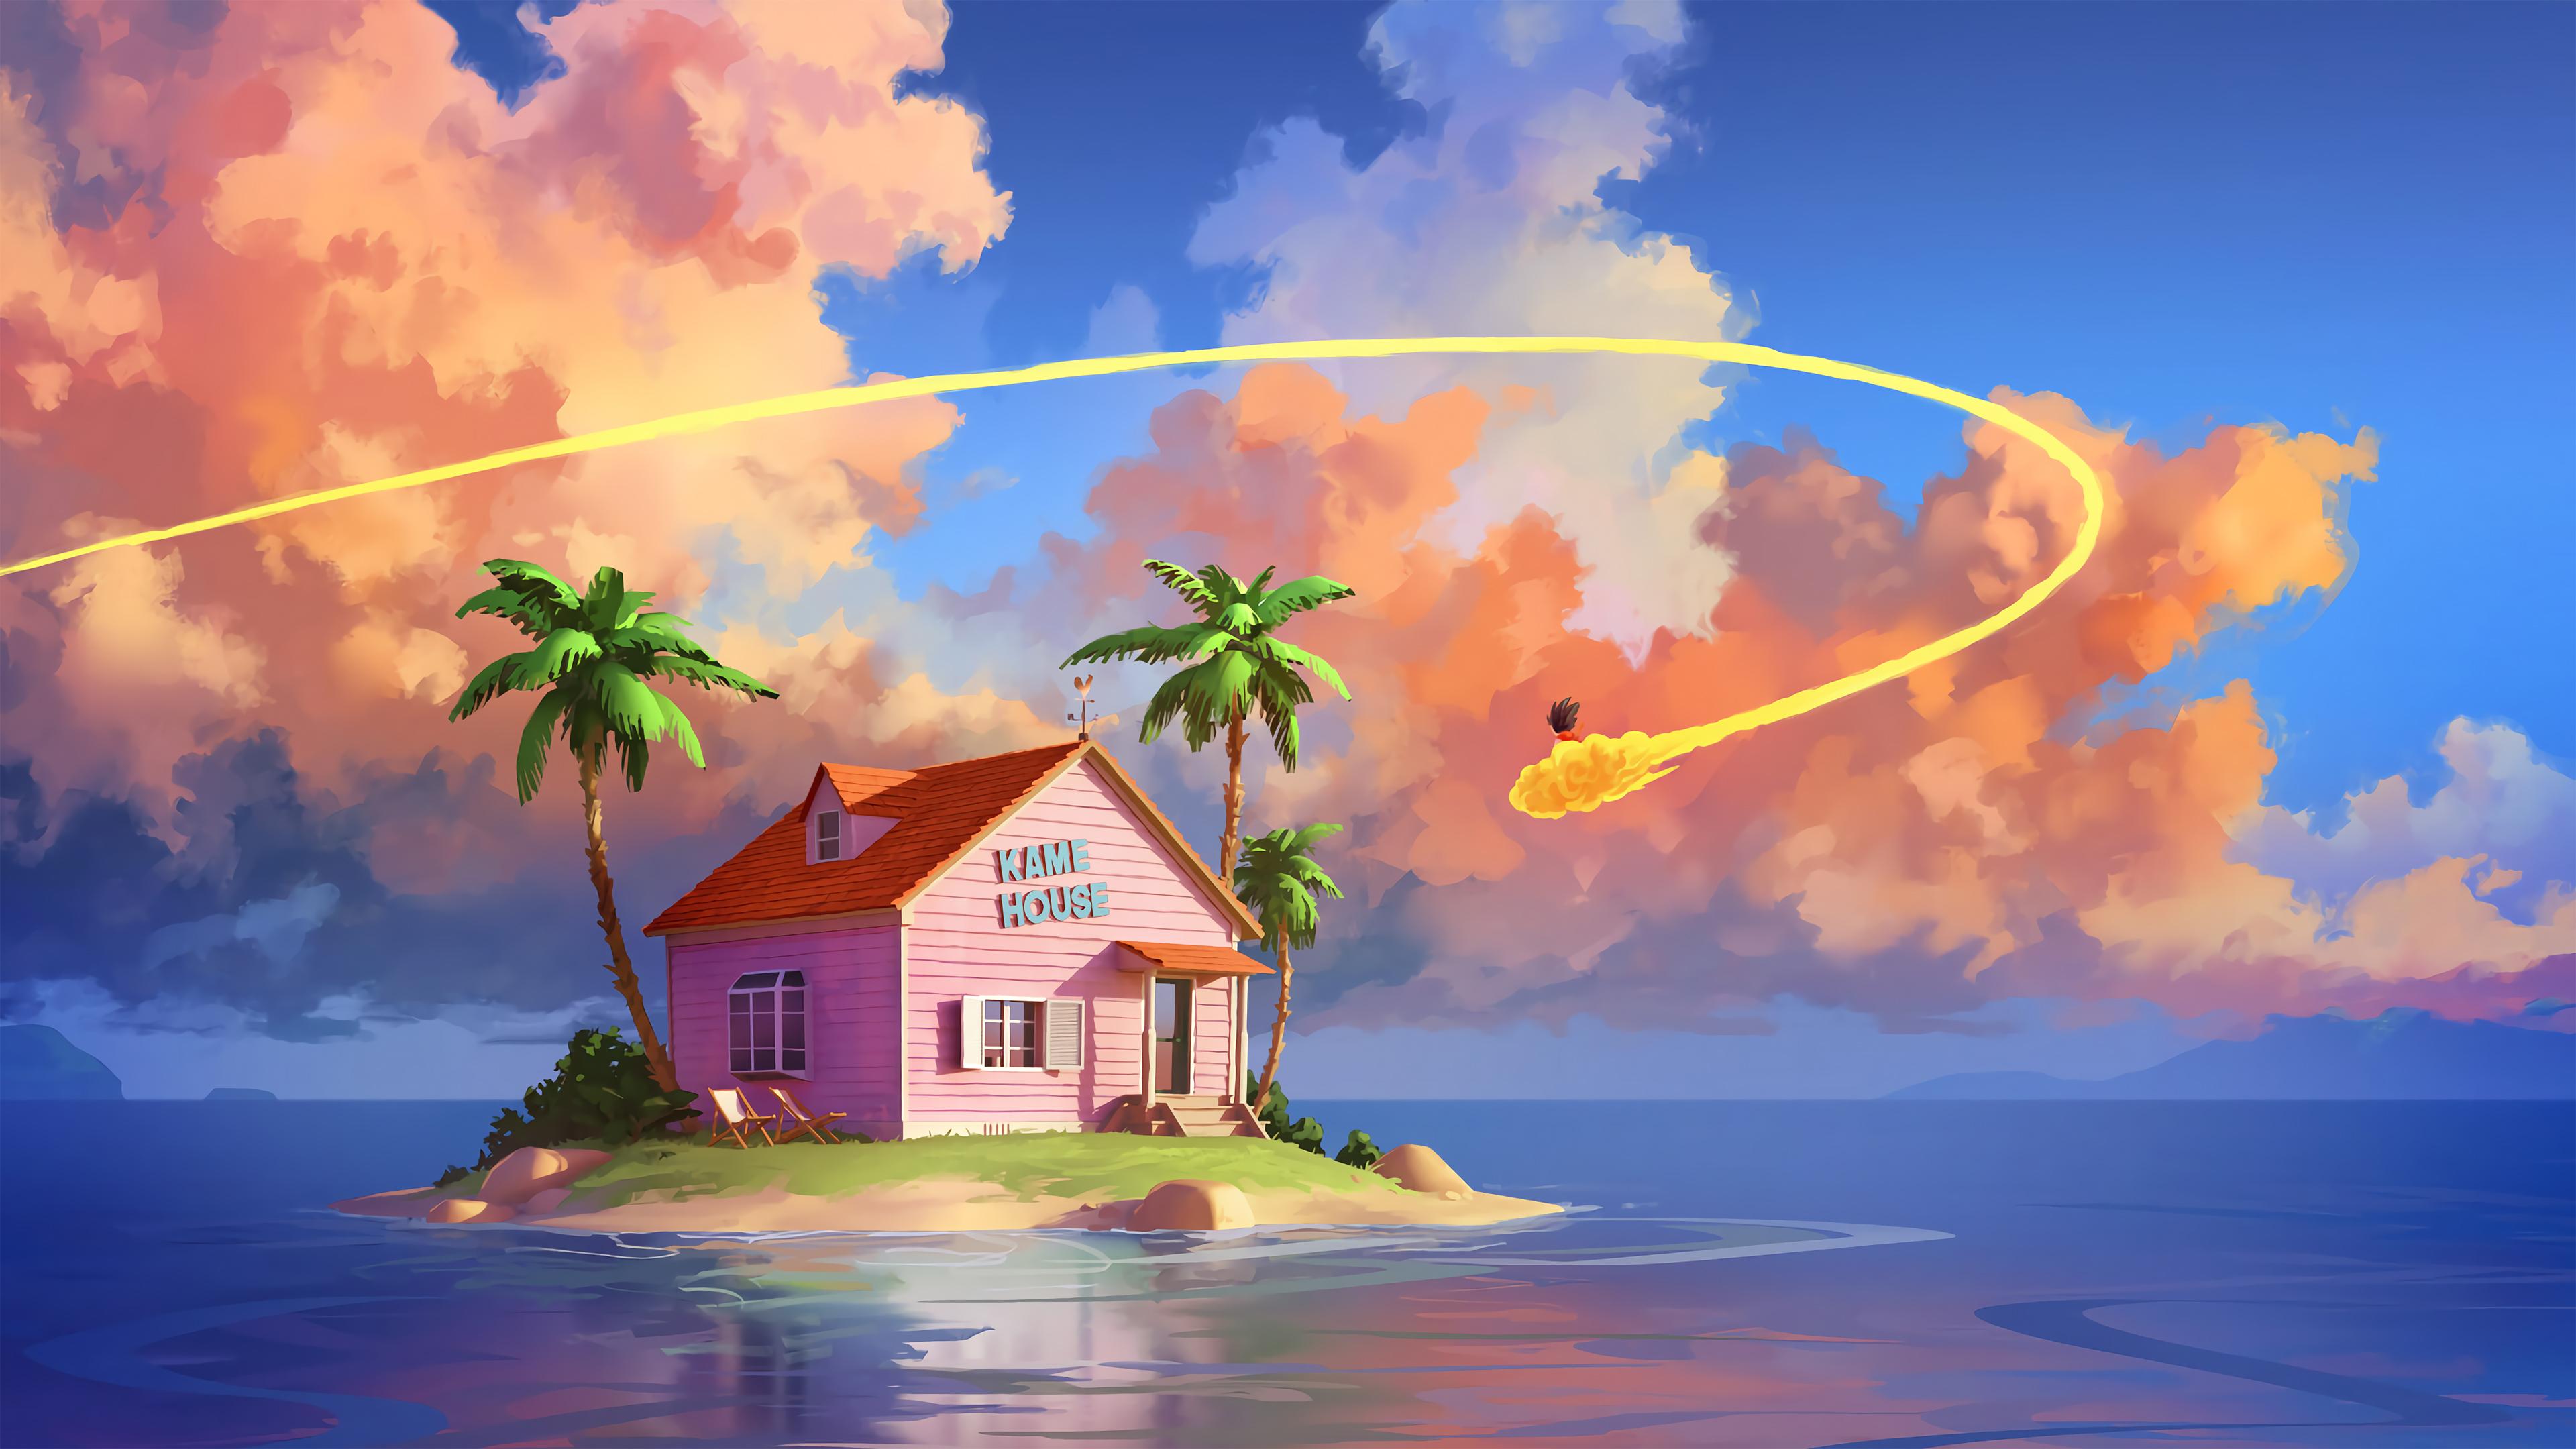 Anime 3840x2160 digital art Son Goku Dragon Ball island anime clouds sea palm trees house water Sylvain Sarrailh